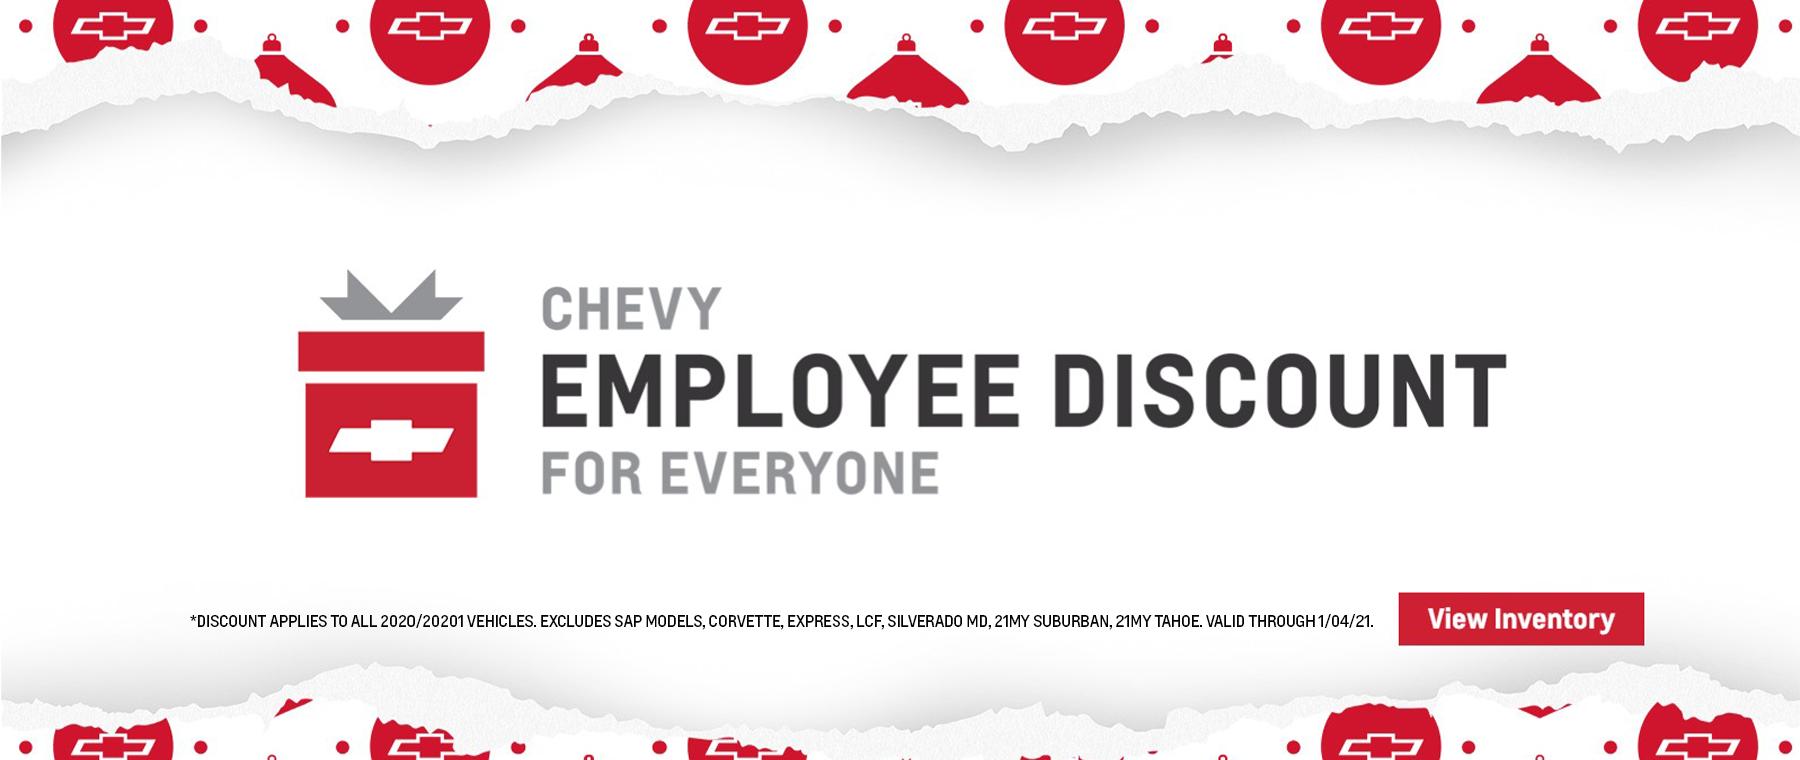 Rick-Hendrick-Chevrolet-Charleston—Dec20—Website-Assets-DI-Homepage-1800×760